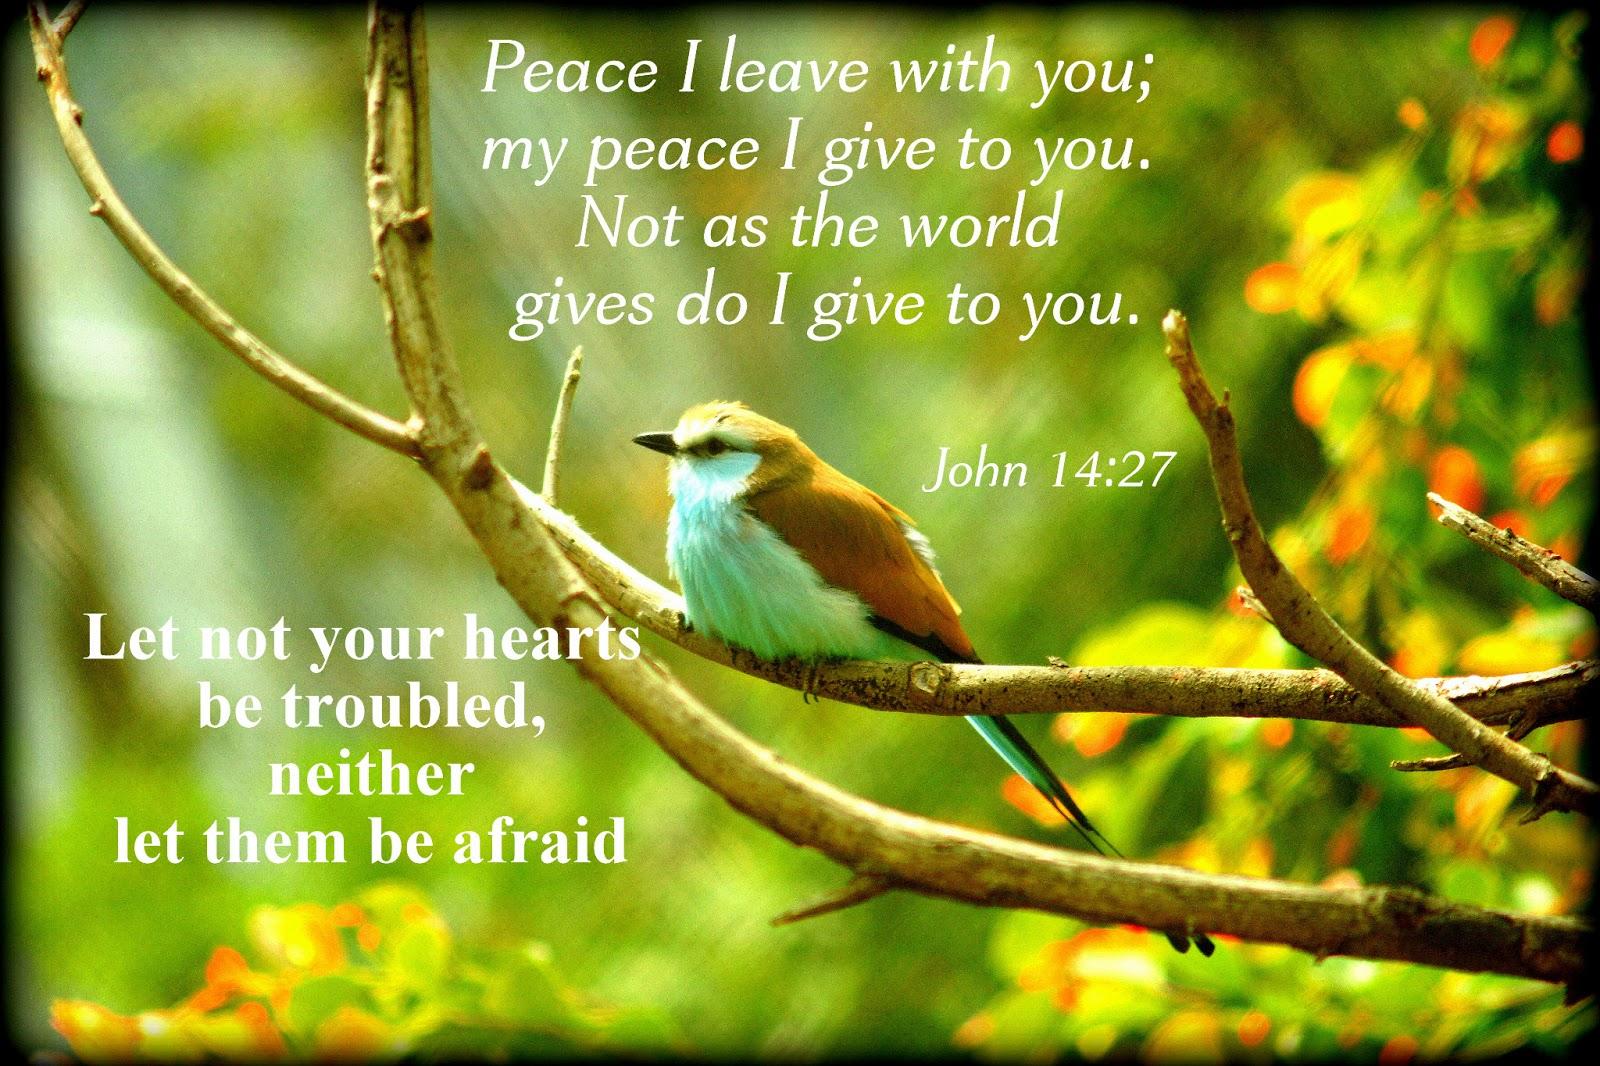 Peace+I+leave+you.jpg